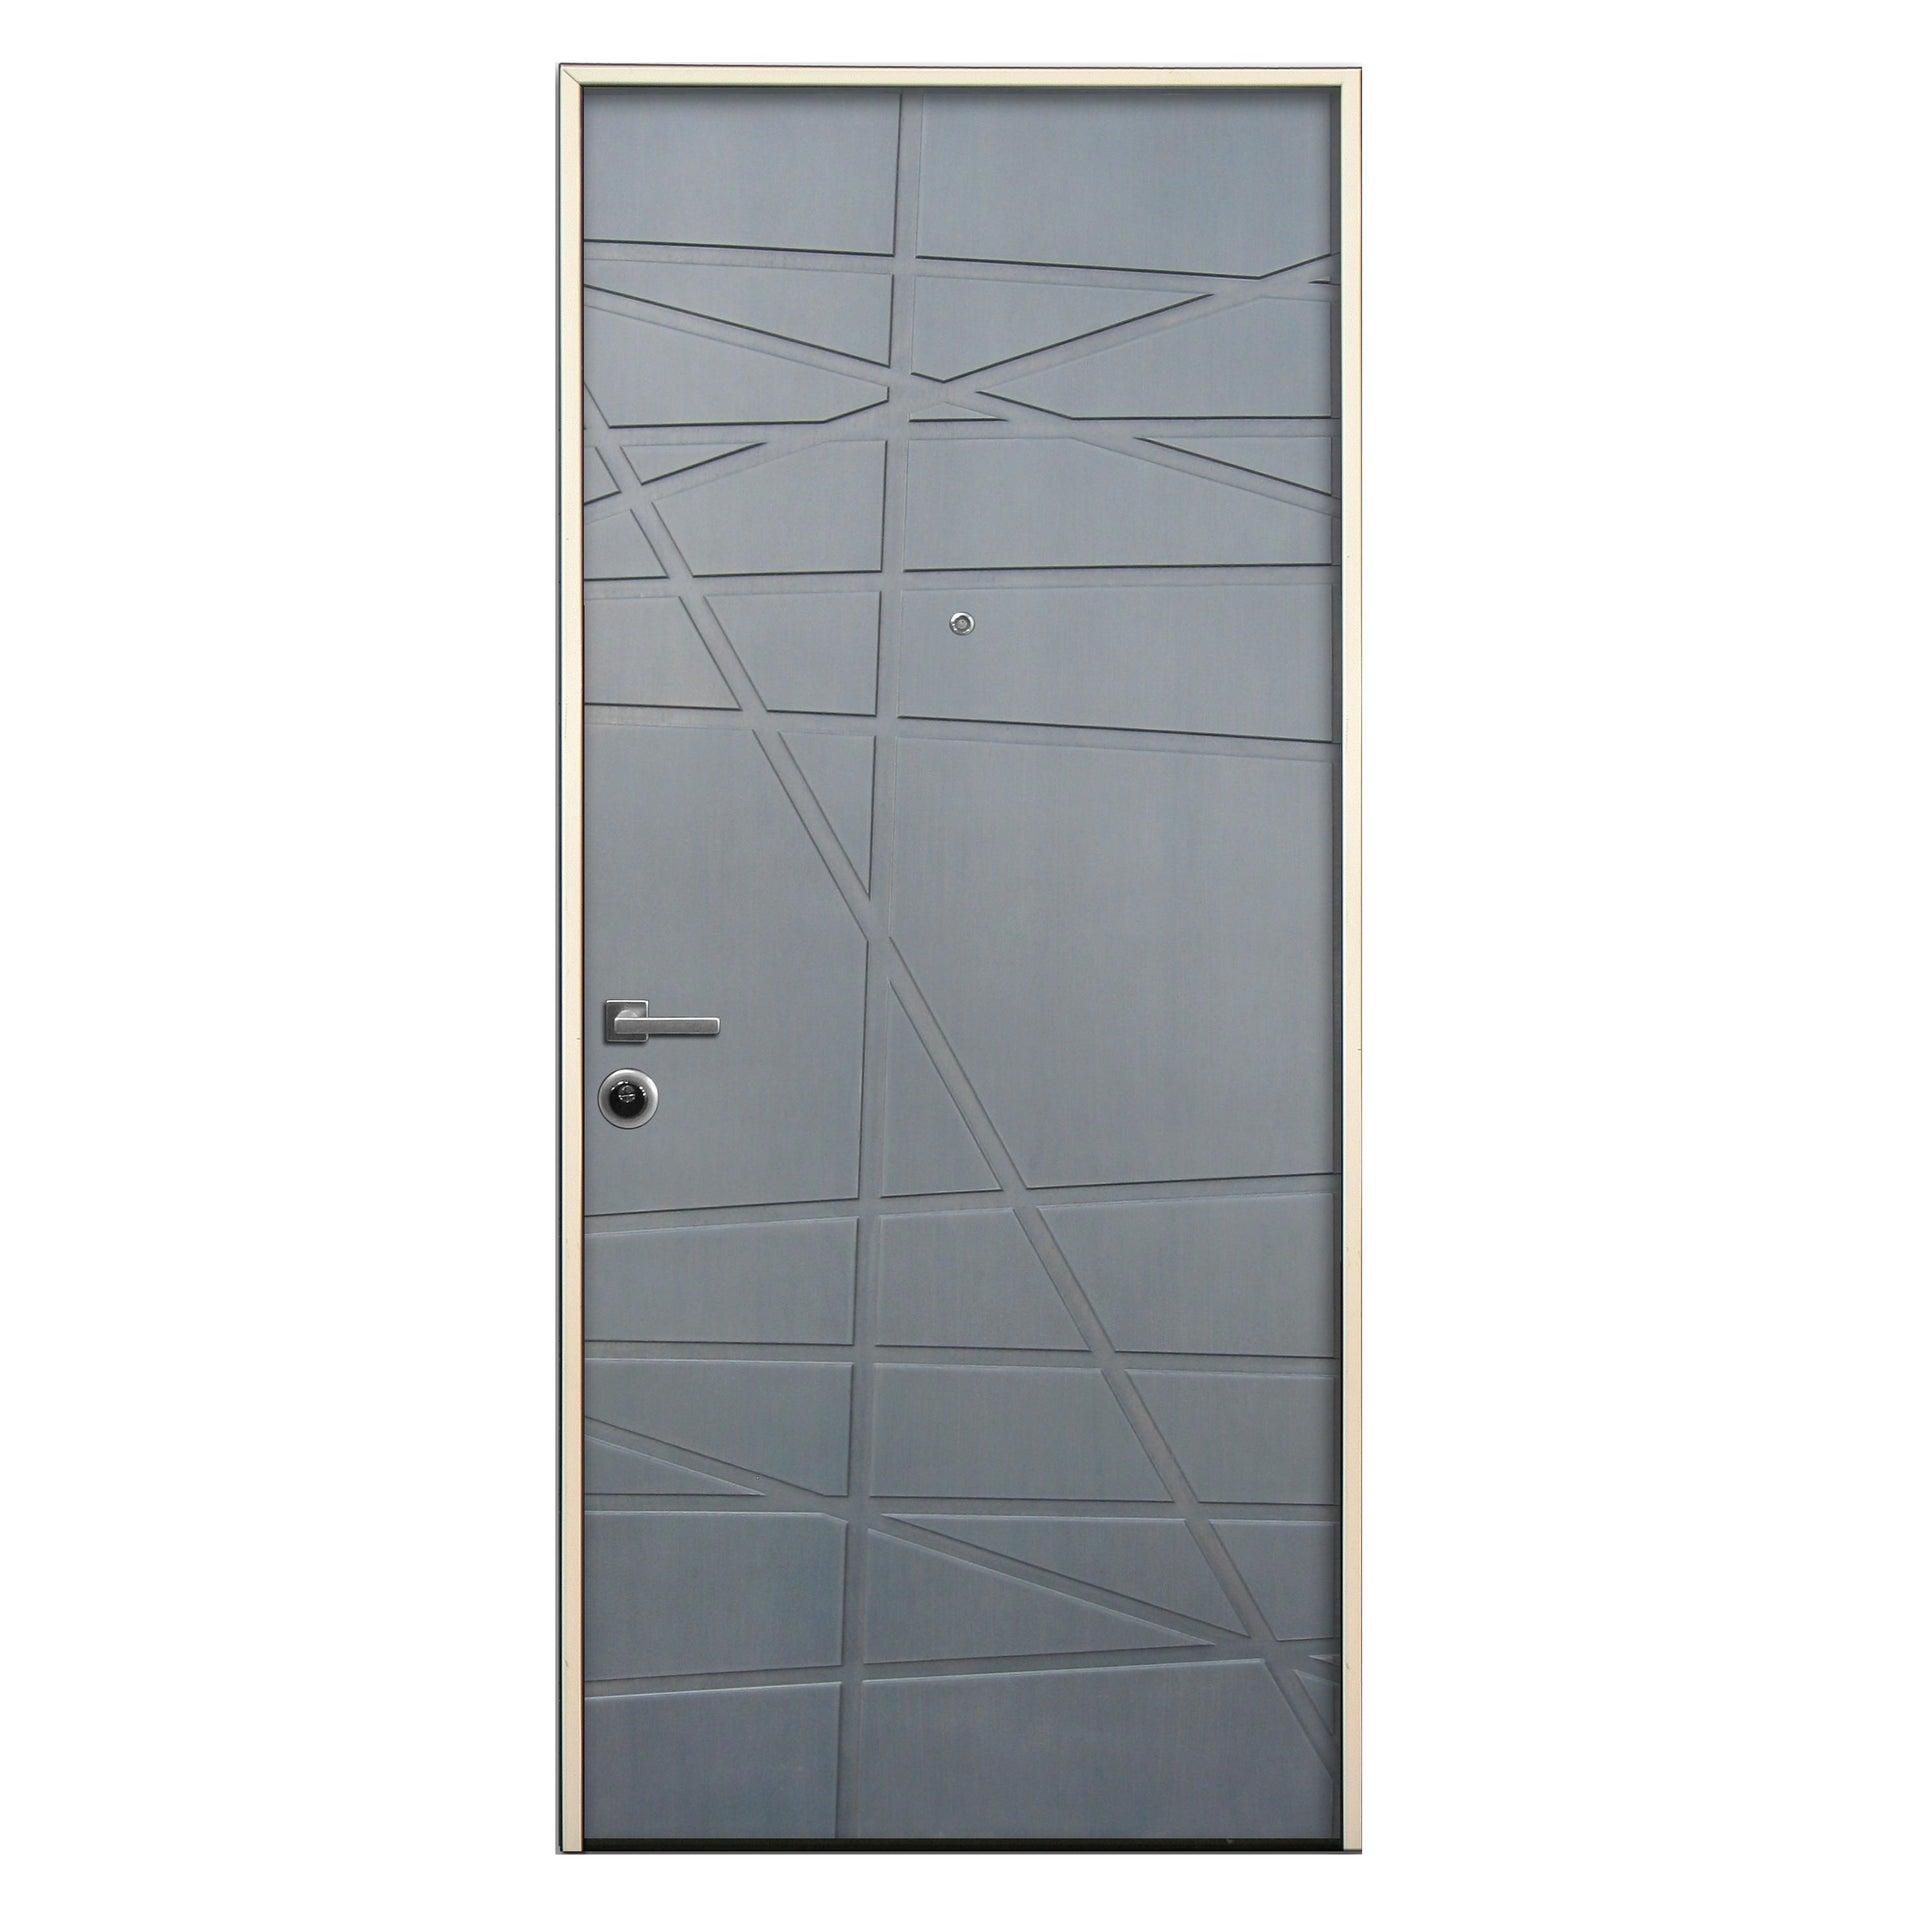 Porta blindata Invisible grigio L 90 x H 210 cm destra - 3